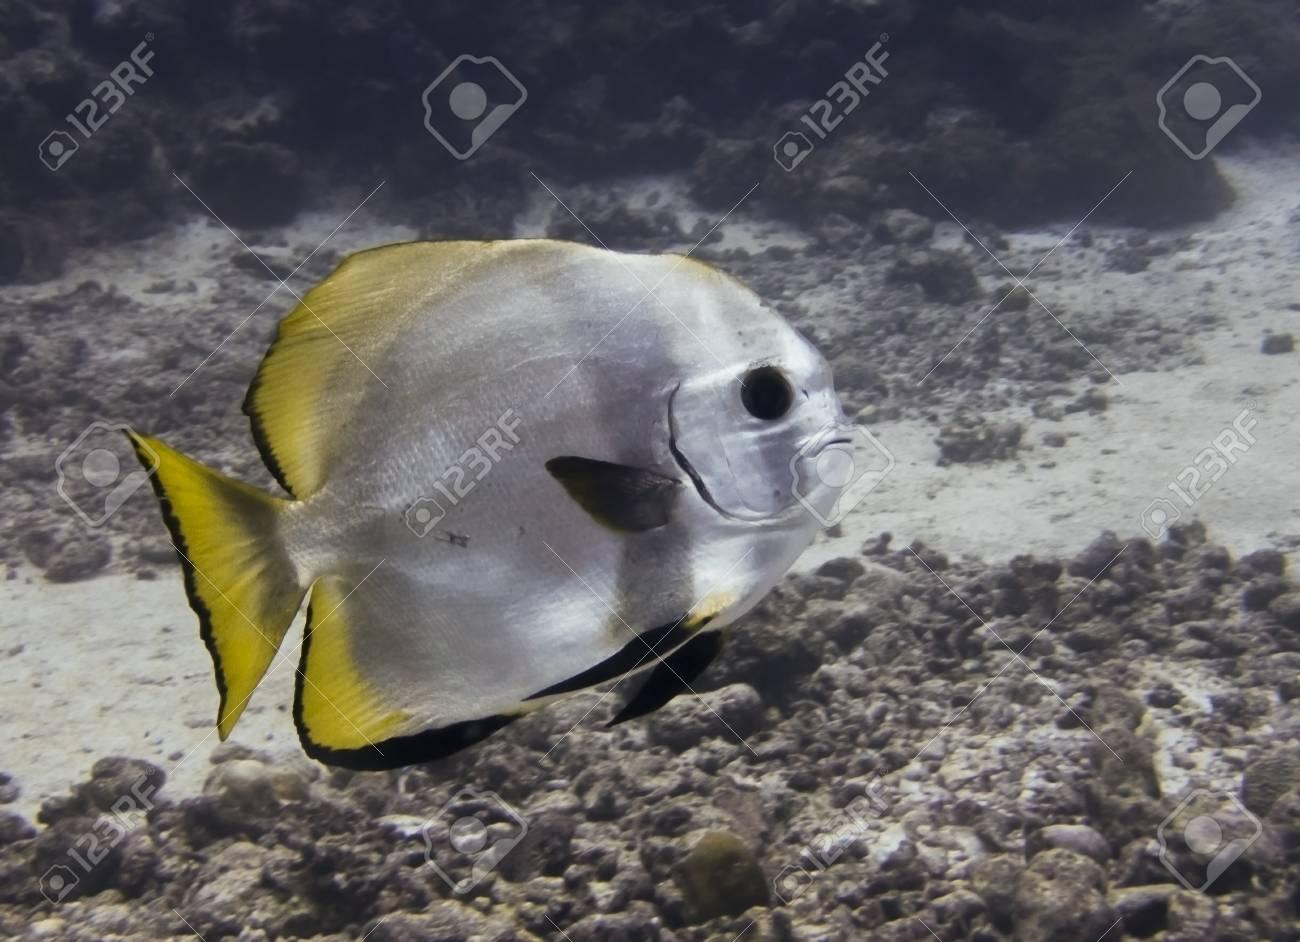 Circular spadefish or batfish close up profile underwater in